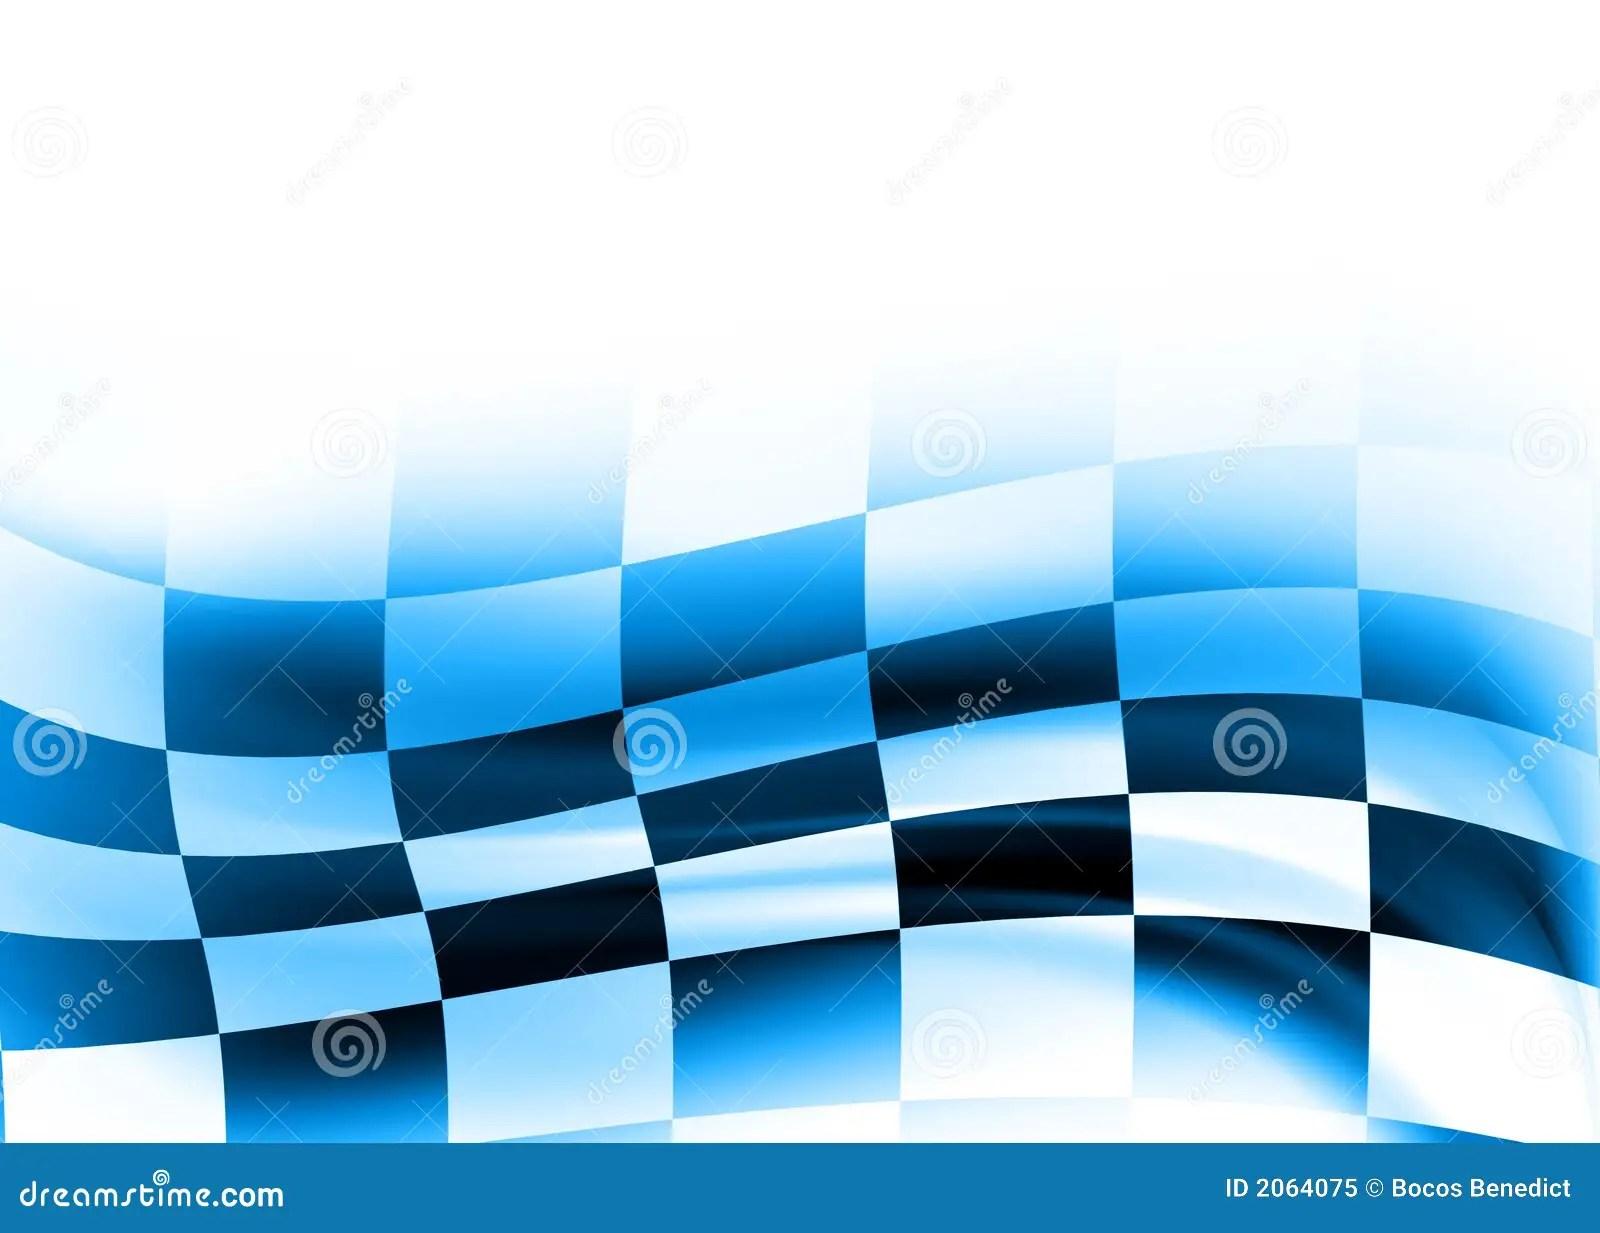 Audio Car Wallpaper Download Abstract Racing Flag Royalty Free Stock Photo Image 2064075